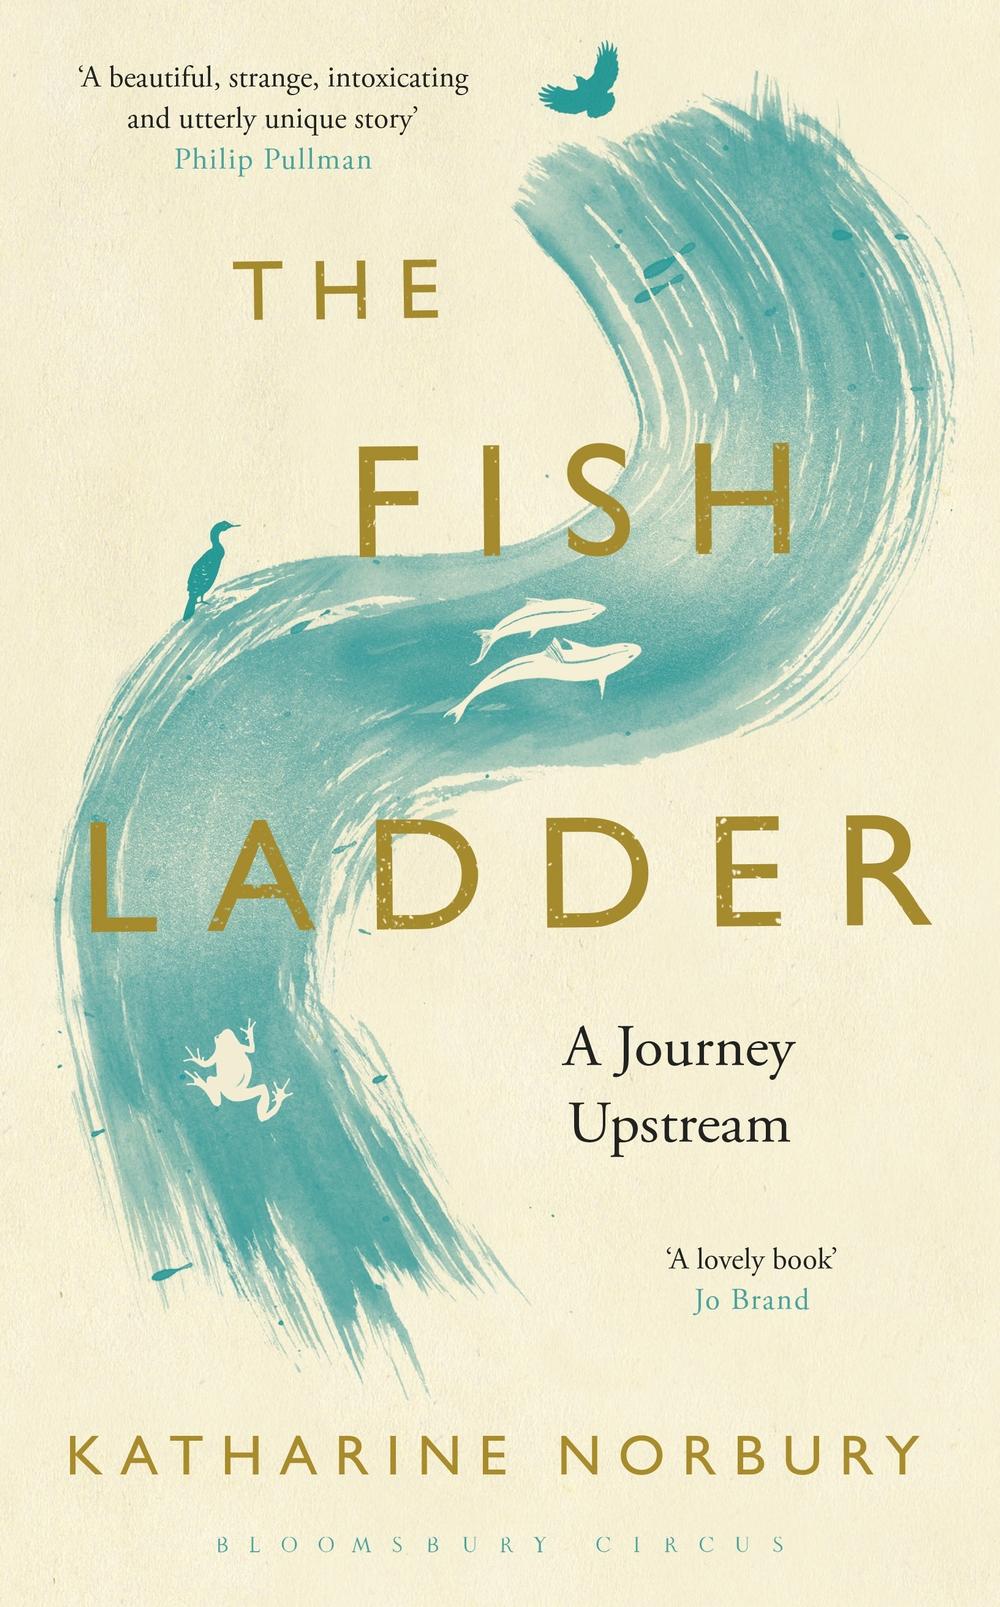 CAPAStudyAbroad_London_Professor_Katharine_Norbury_-_The_Fish_Ladder_jacket-1